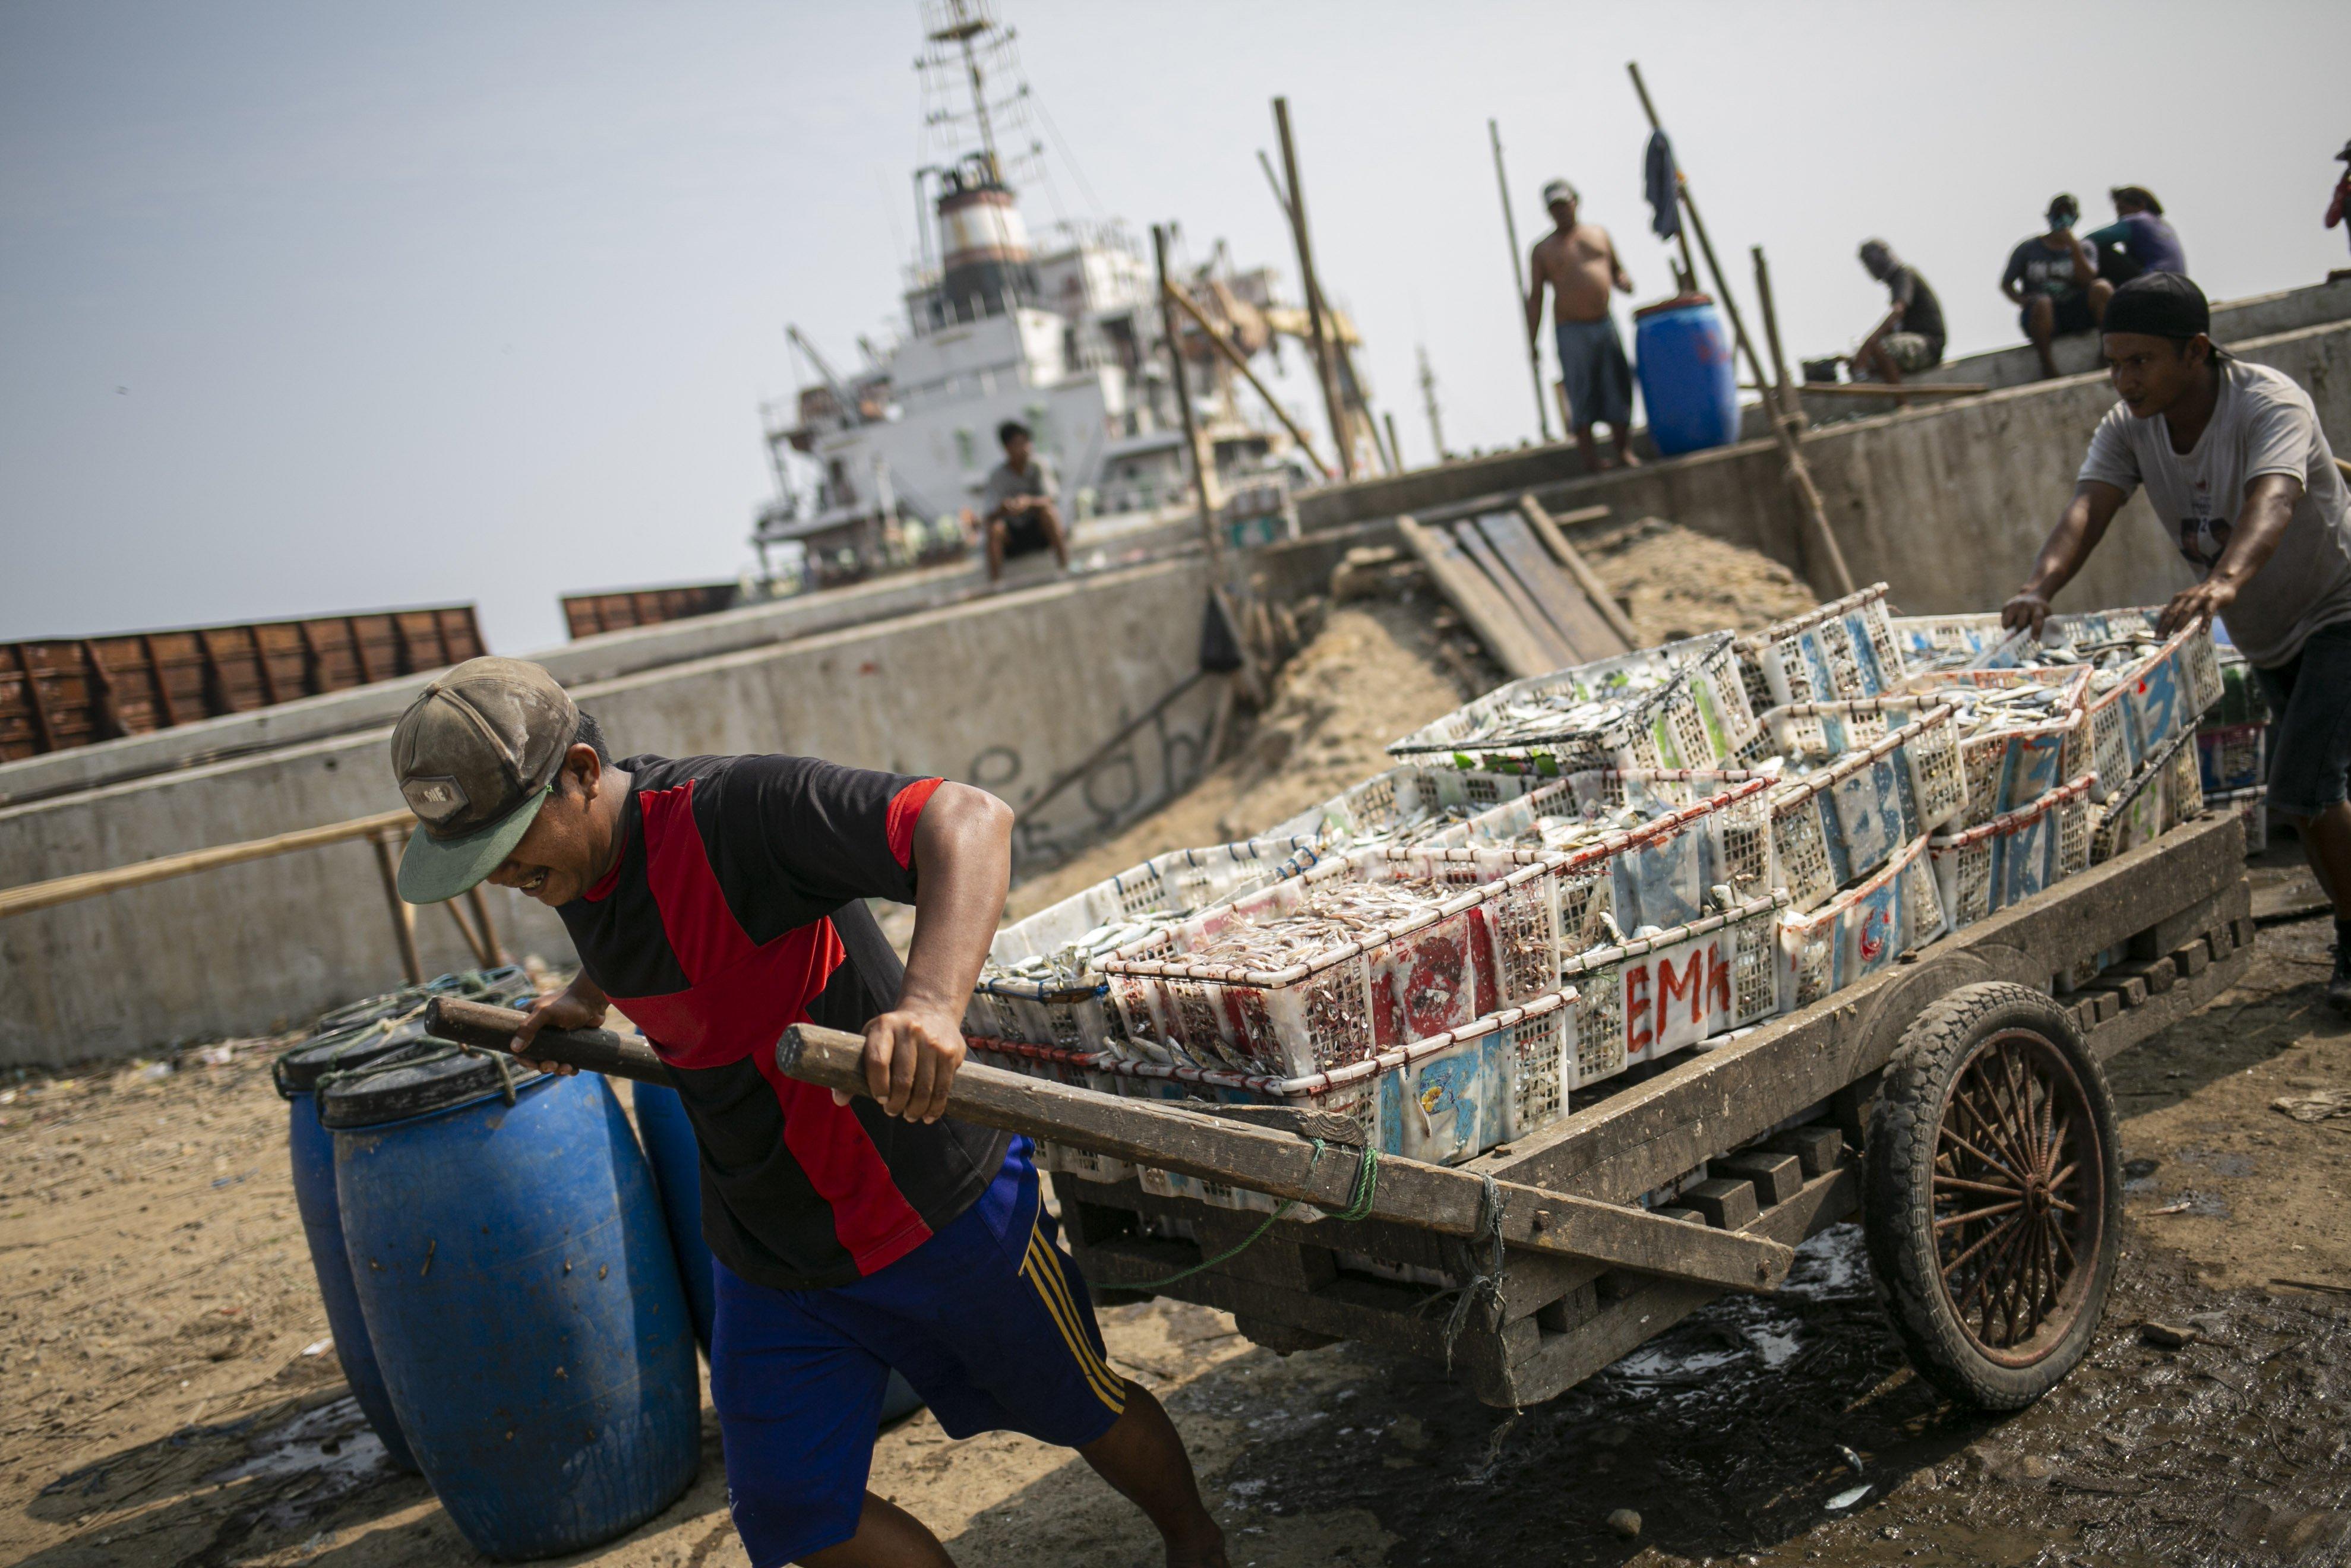 Sejumlah nelayan mengangkut ikan hasil tangkapan di Kampung Nelayan, Jakarta Utara, Minggu (9/8/2020). Kesatuan Nelayan Tradisional Indonesia (KNTI) mengklaim penurunan penjualan tangkapan nelayan mencapai 21 persen dan pendapatan hingga 90 persen akibat merebaknya virus covid-19.